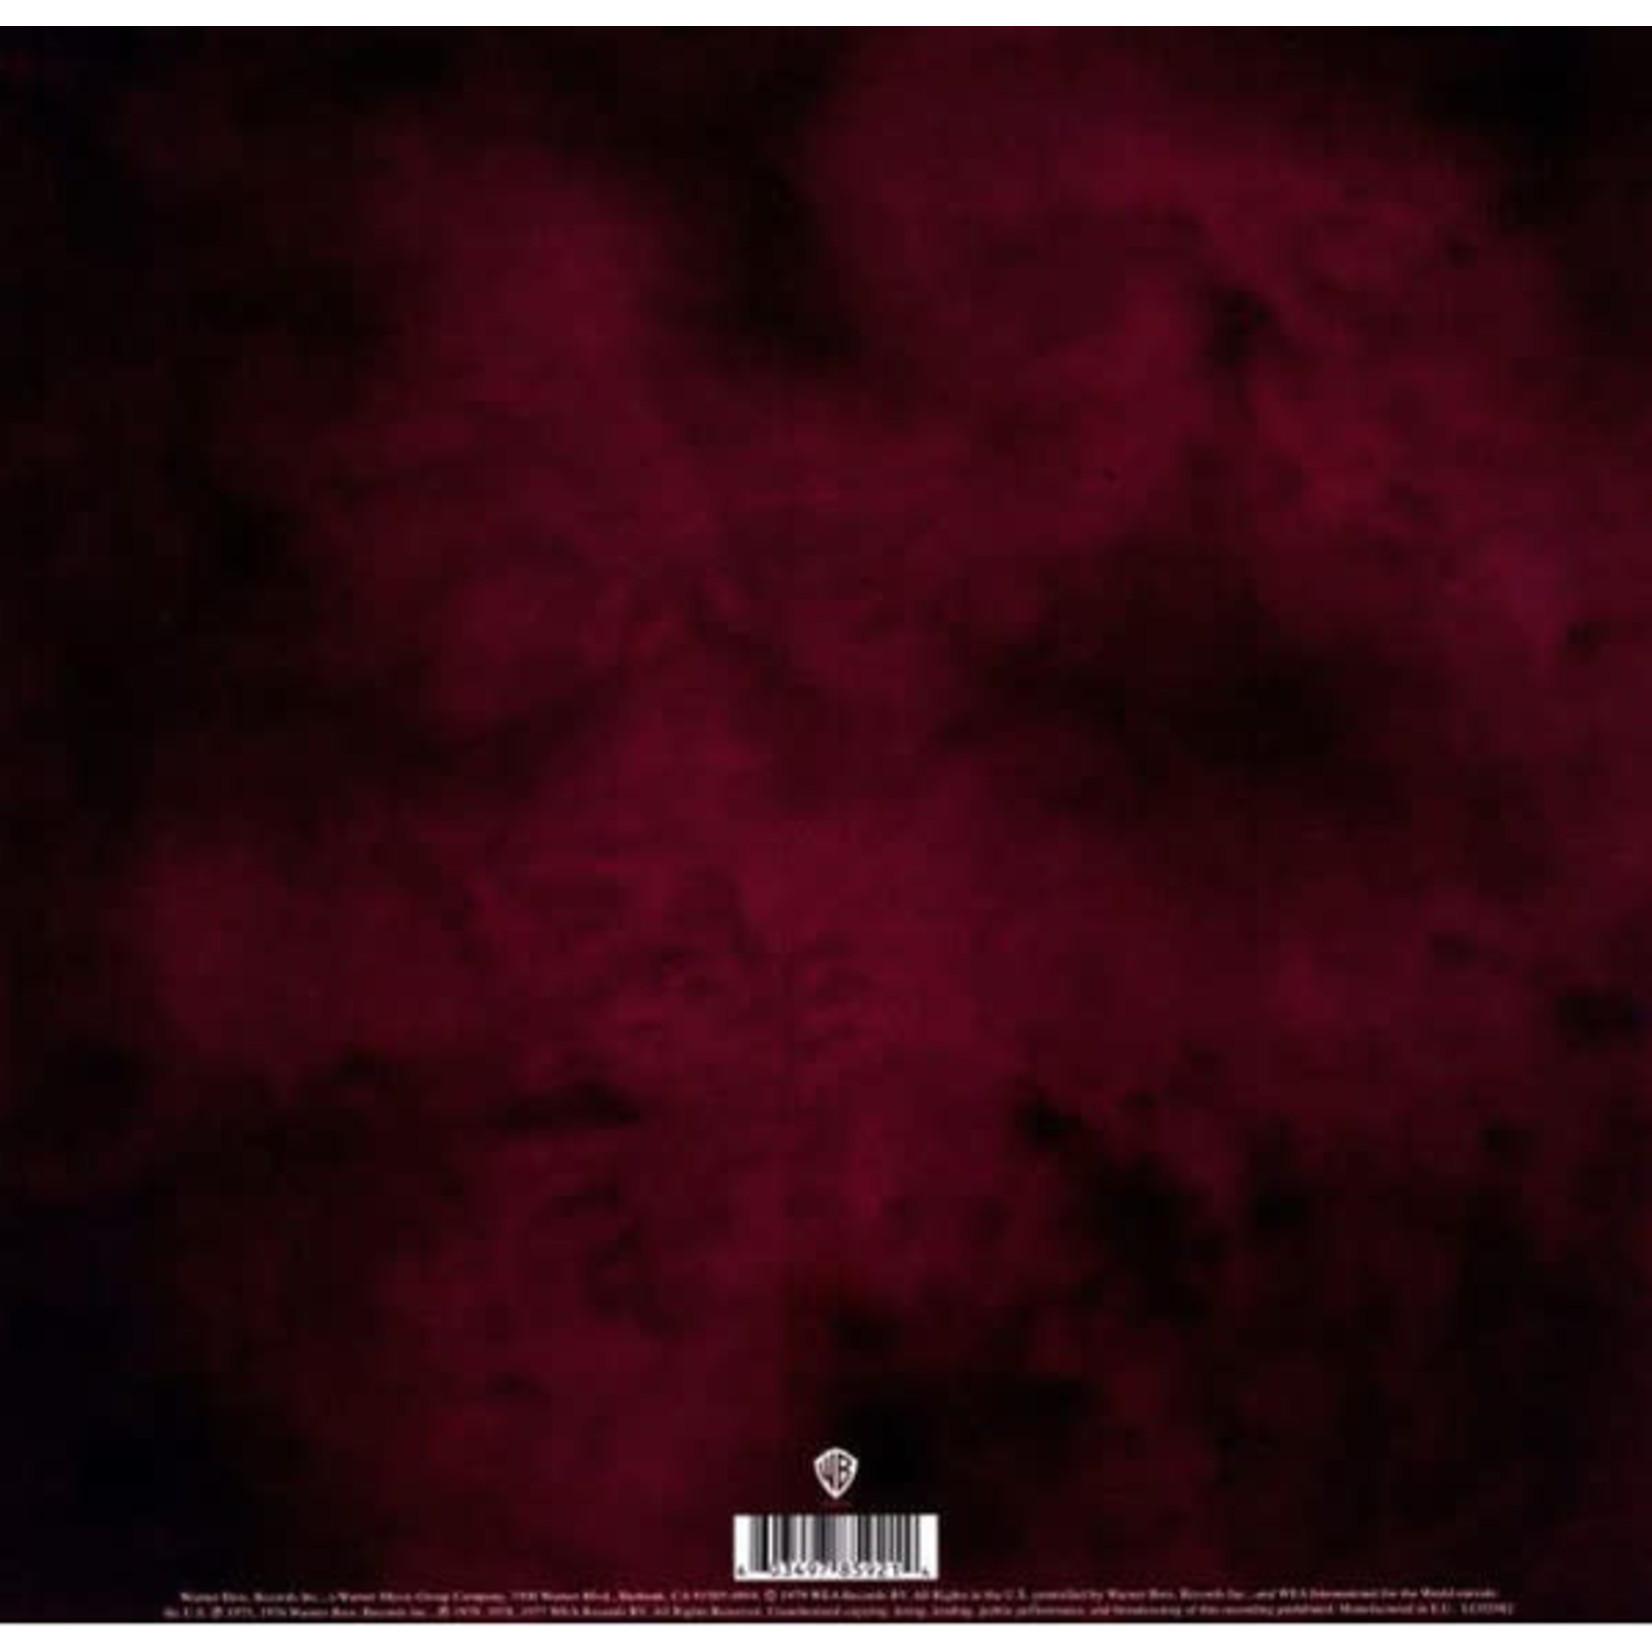 ROD STEWART GREATEST HITS VOL. 1 (WHITE LP)